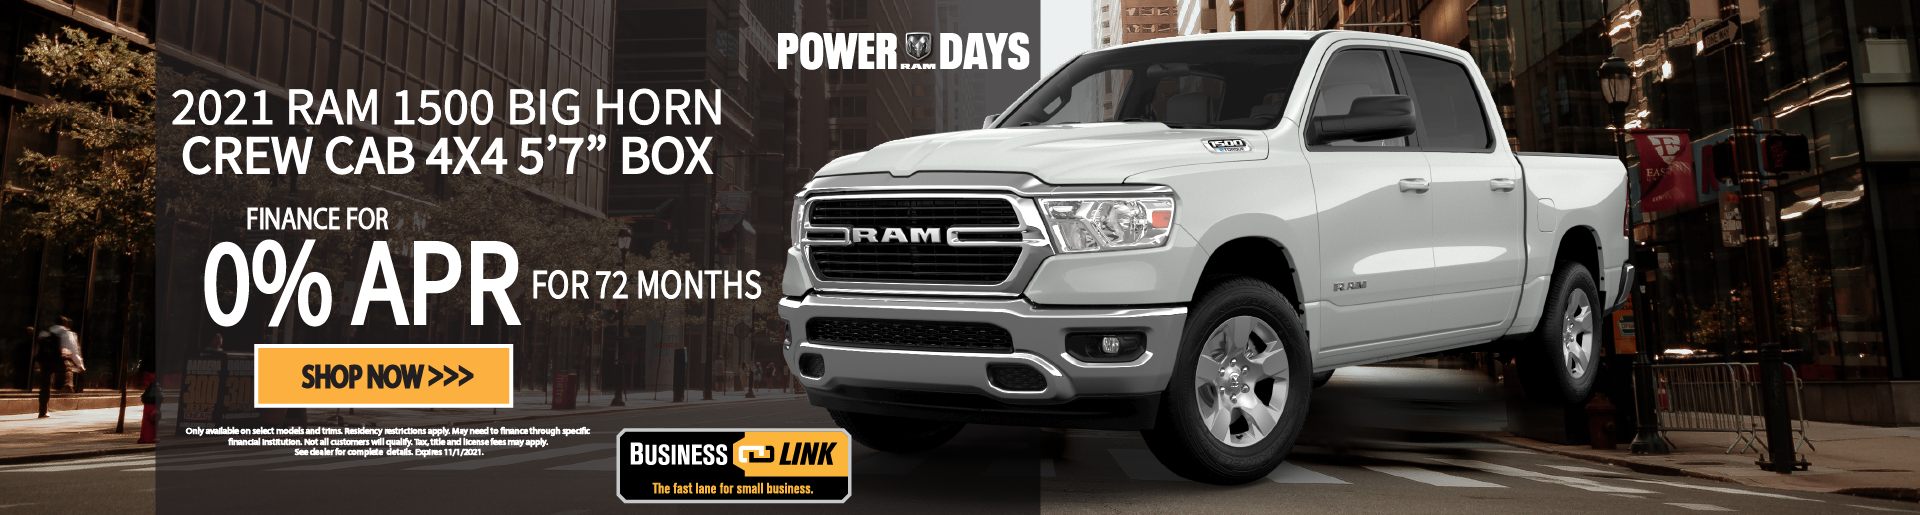 NEW 2021 RAM 1500 BIG HORN® CREW CAB 4X4 5'7- BOX